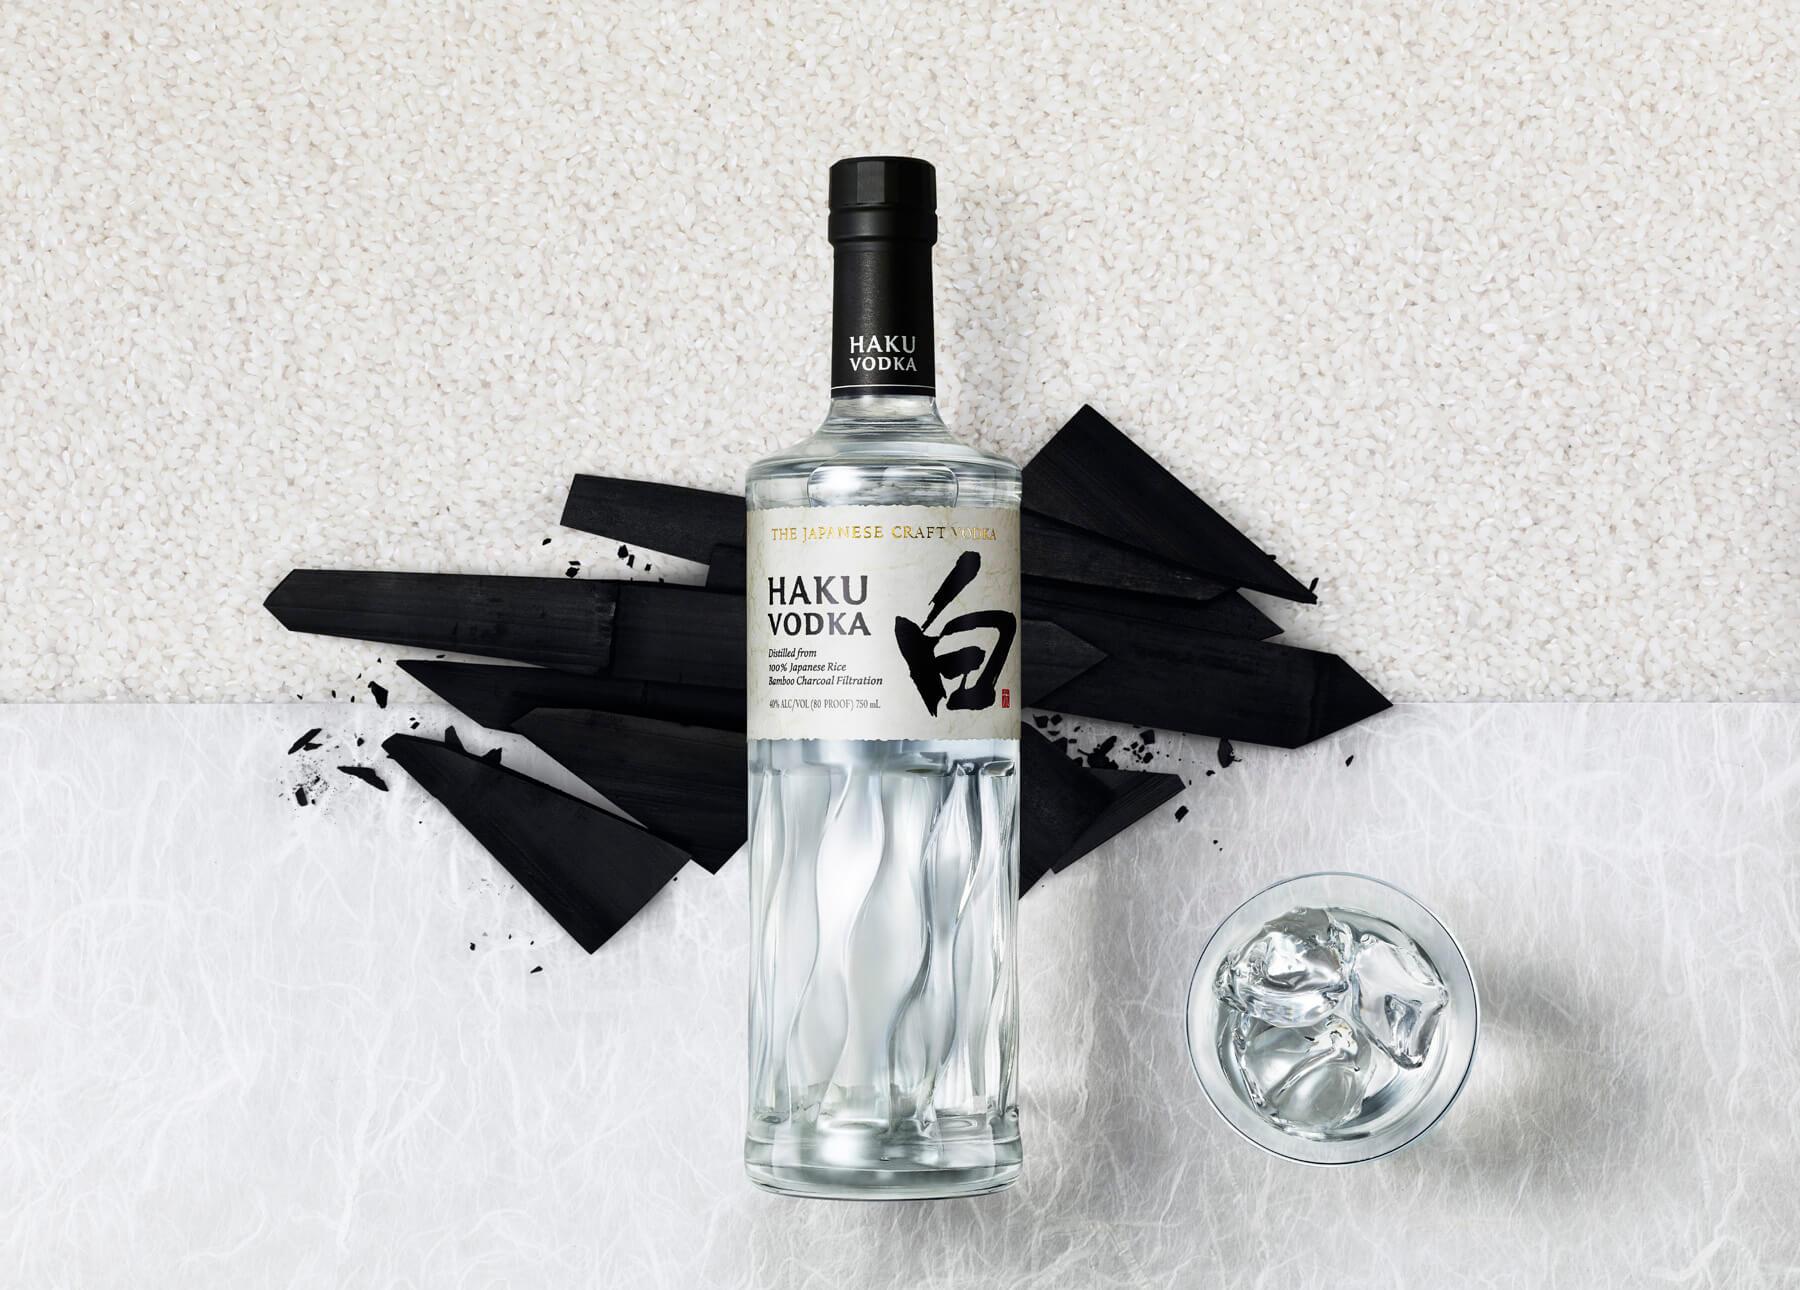 Haku Japanese Vodka is the latest addition to Beam Suntory's spirits portfolio